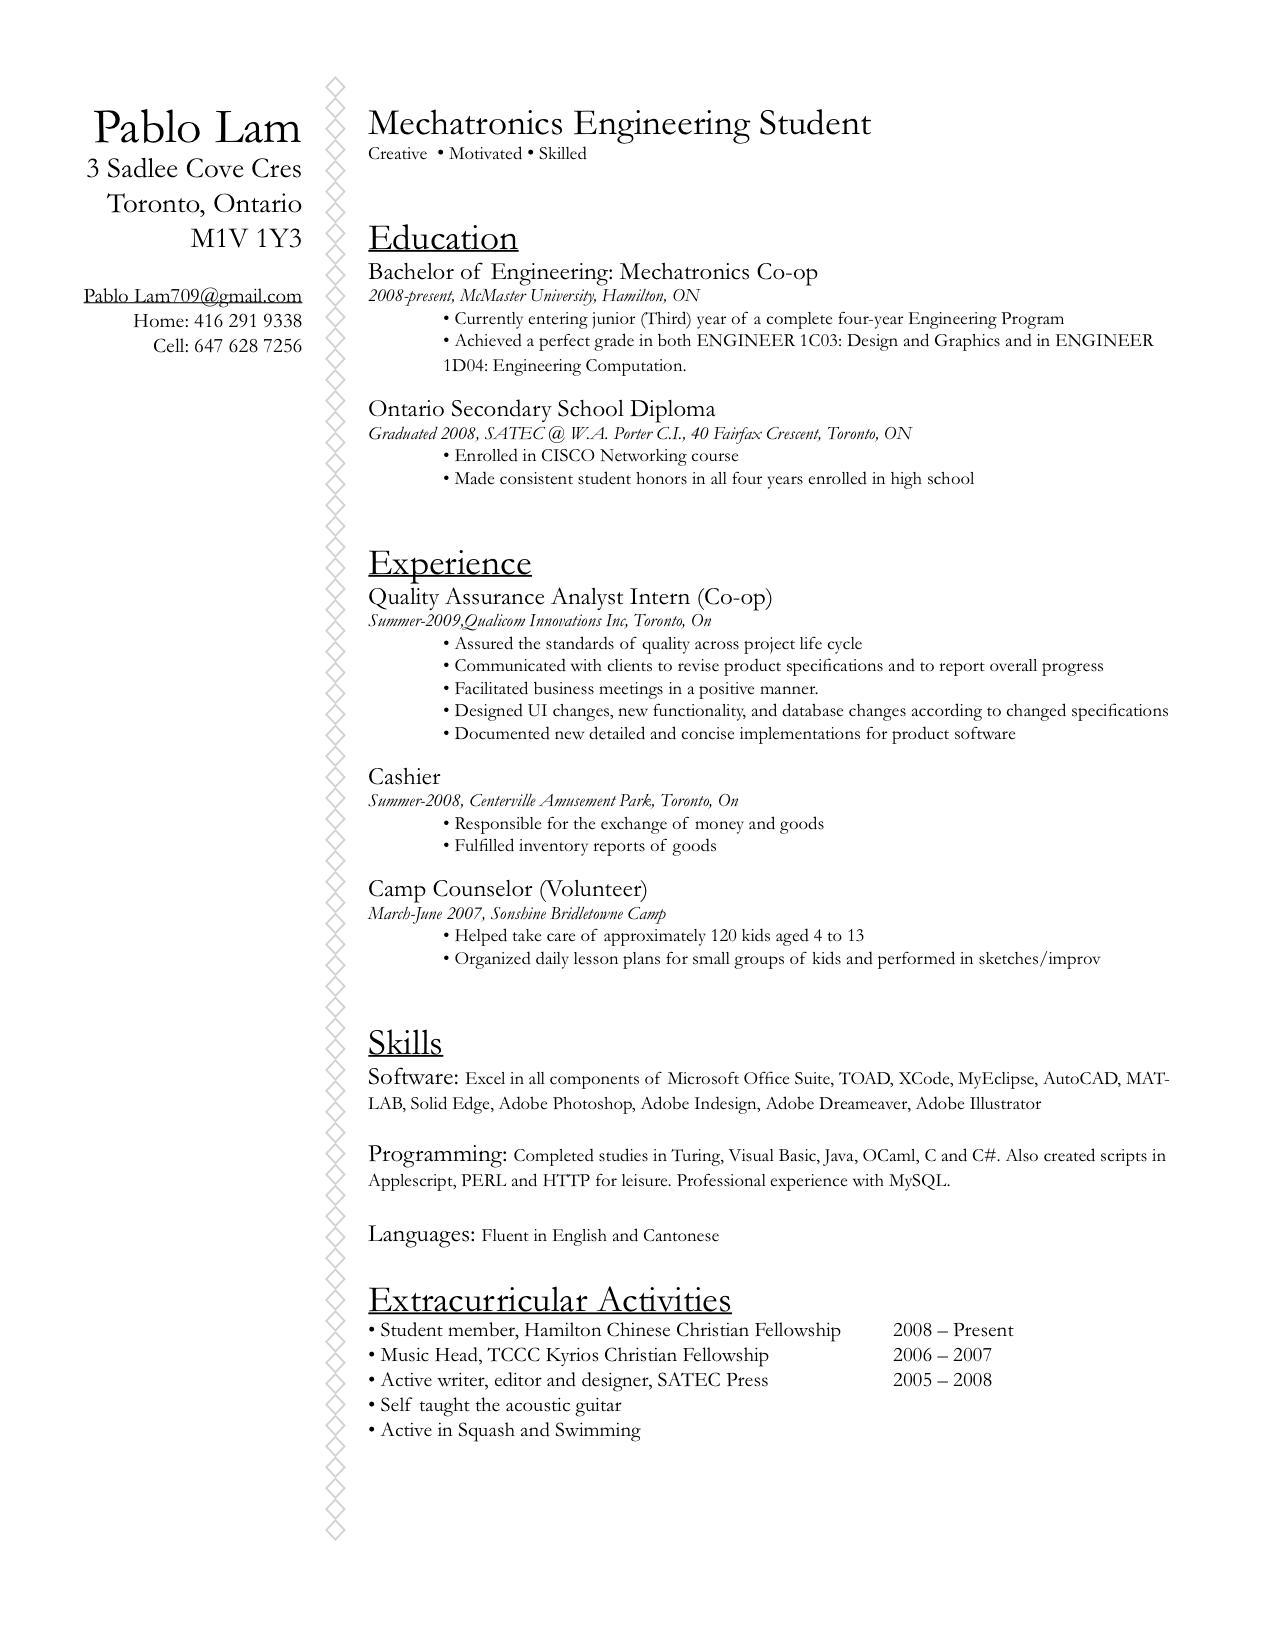 resume 2010 by p3nsuk33 on deviantart